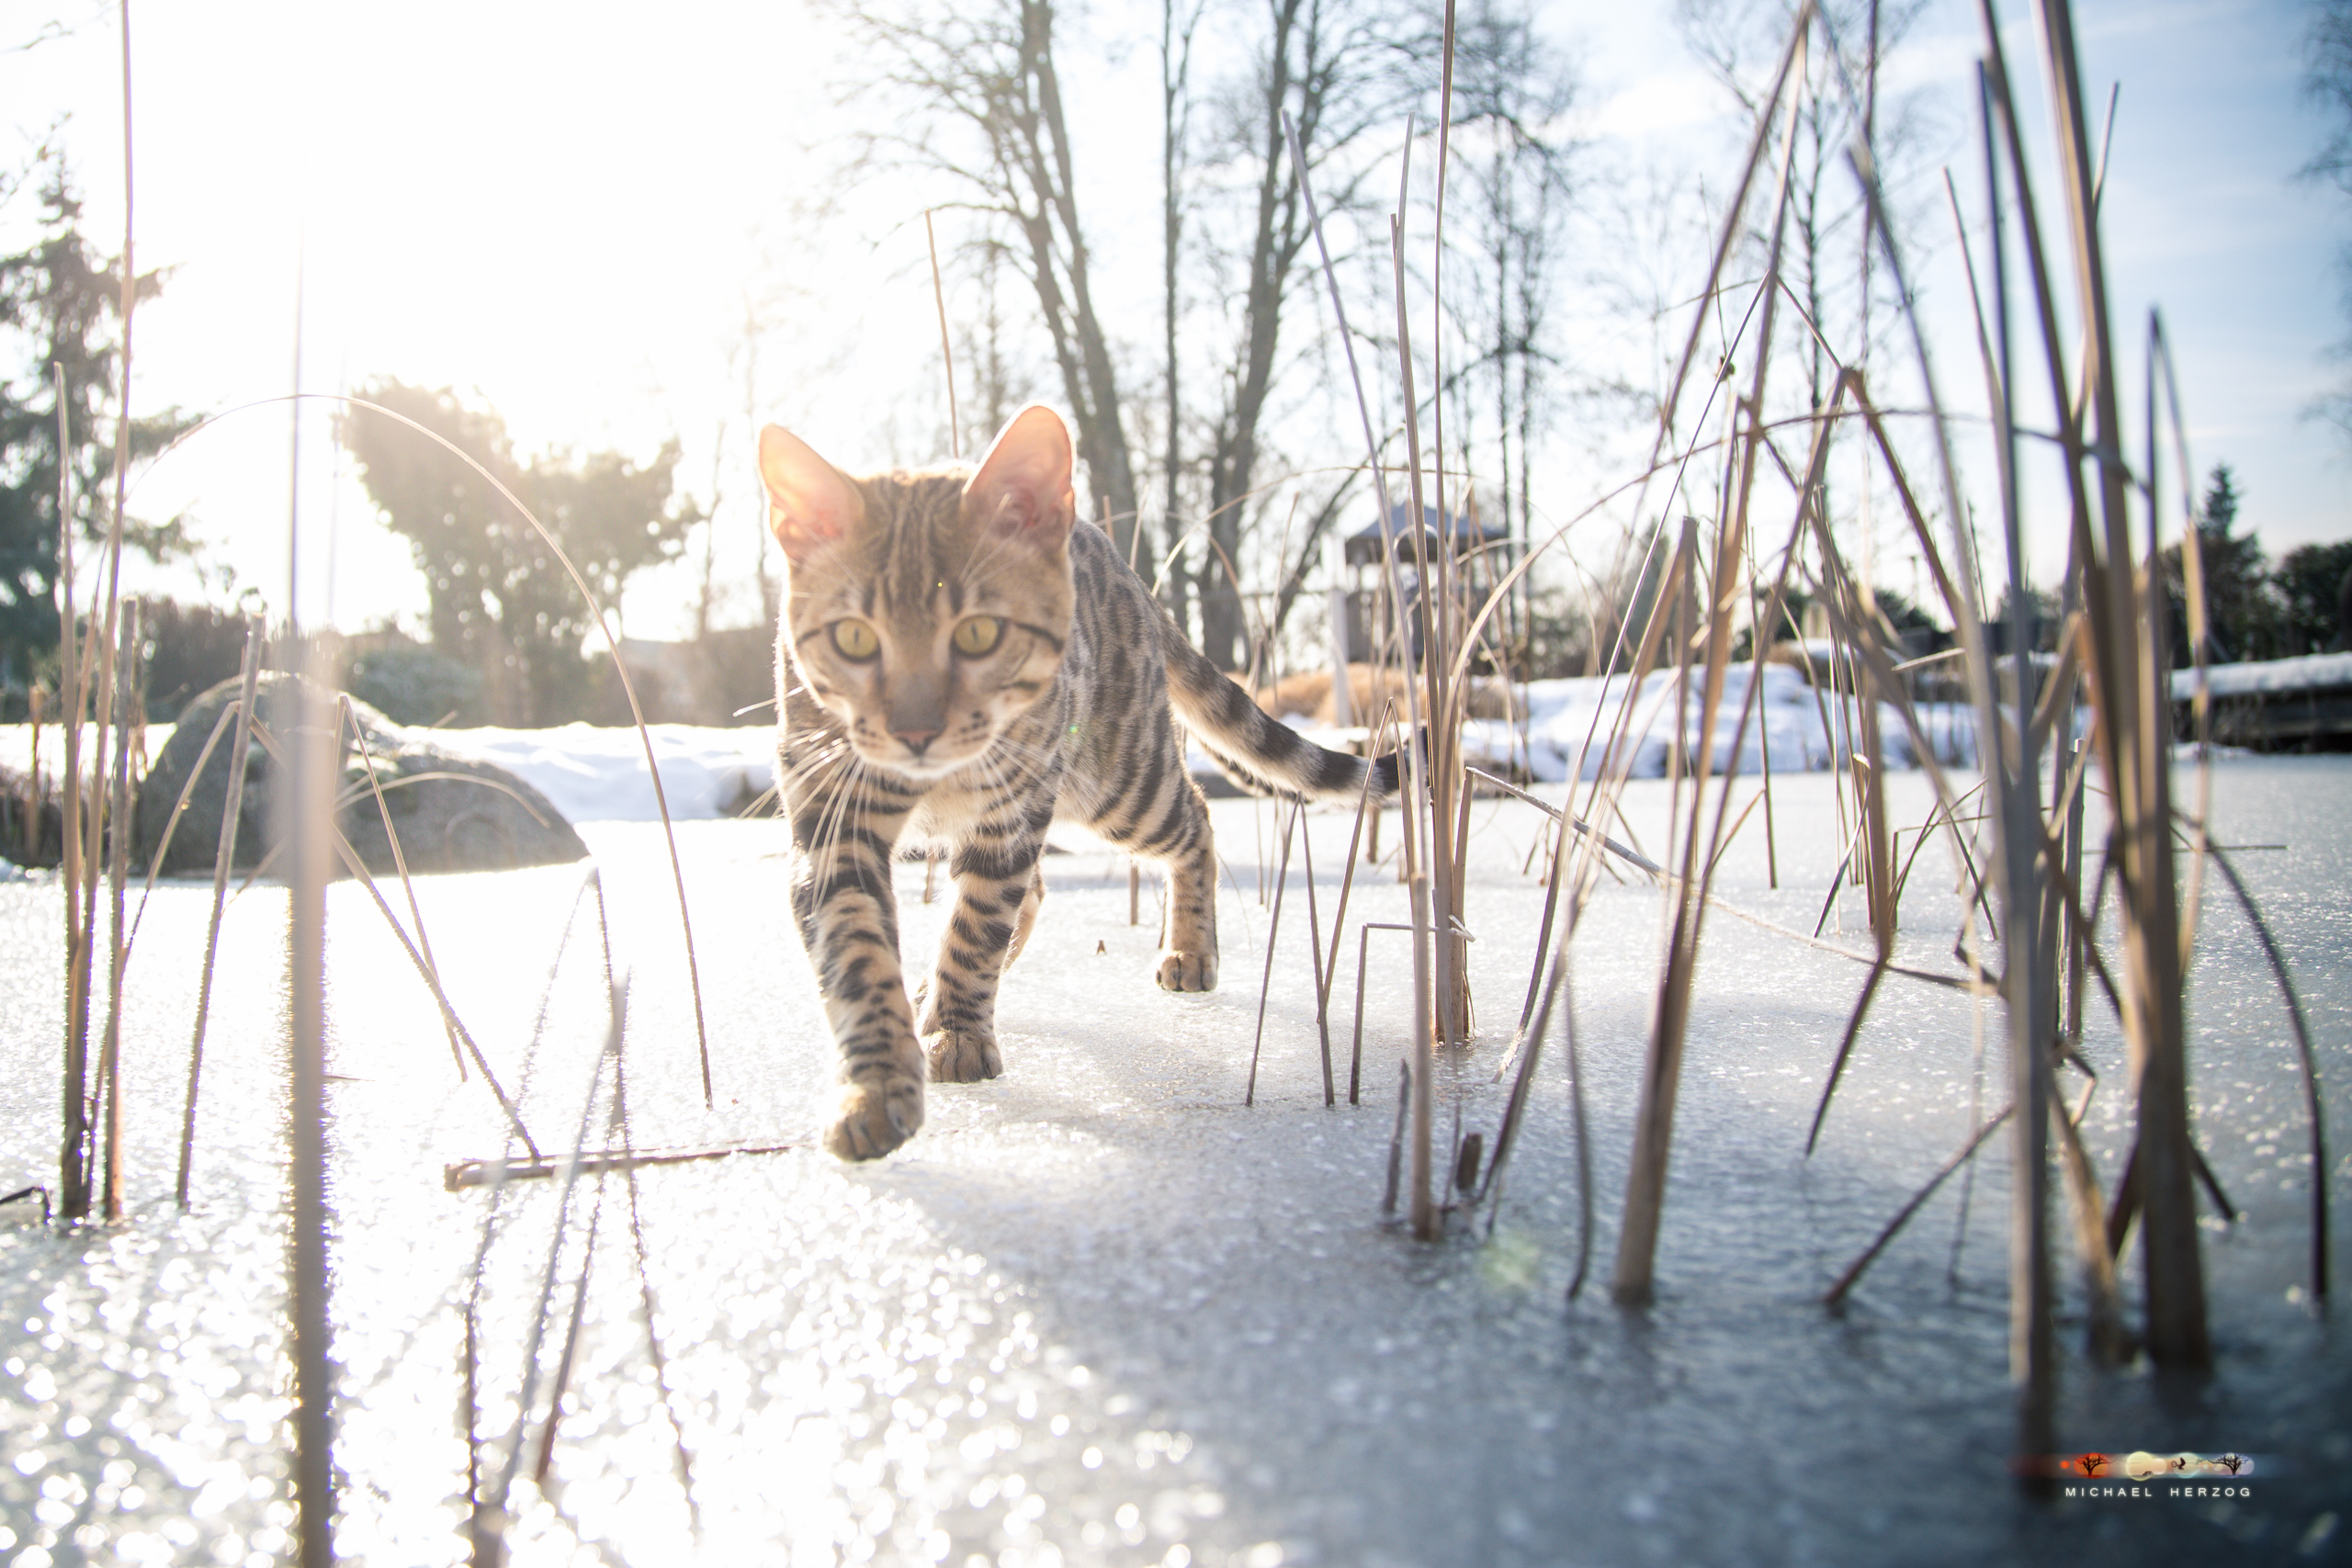 BALUARI_Winter2019_Garten_MichaelHerzog-8675-2.jpg